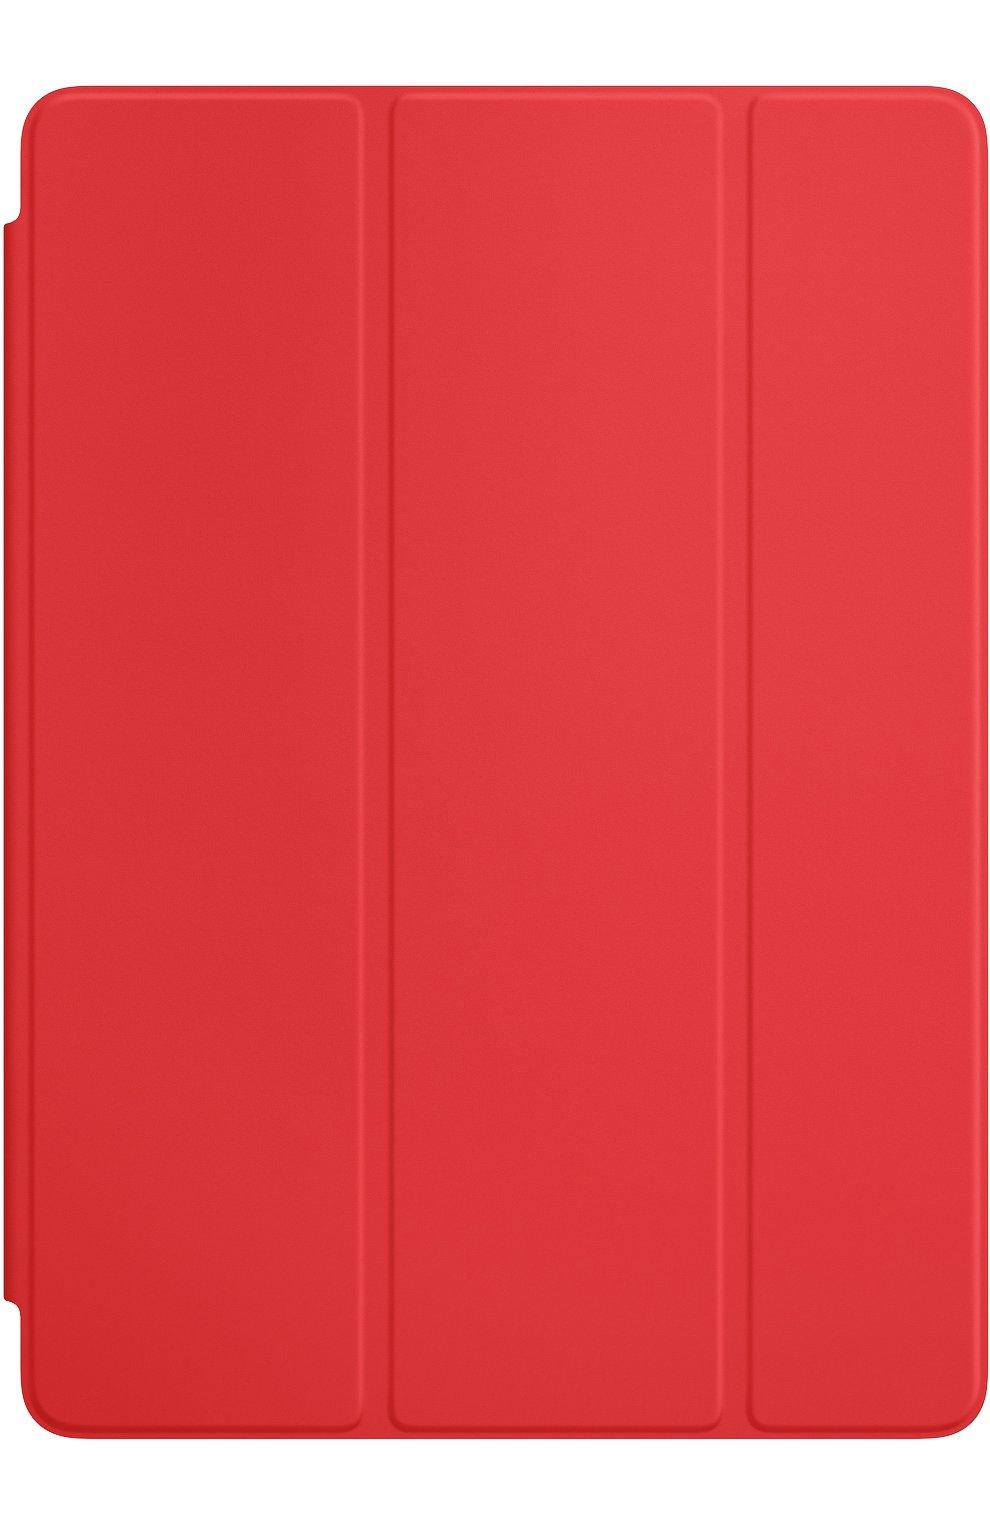 "Чехол-обложка smart cover для ipad pro 9.7"" APPLE  красного цвета, арт. MM2D2ZM/A | Фото 1"